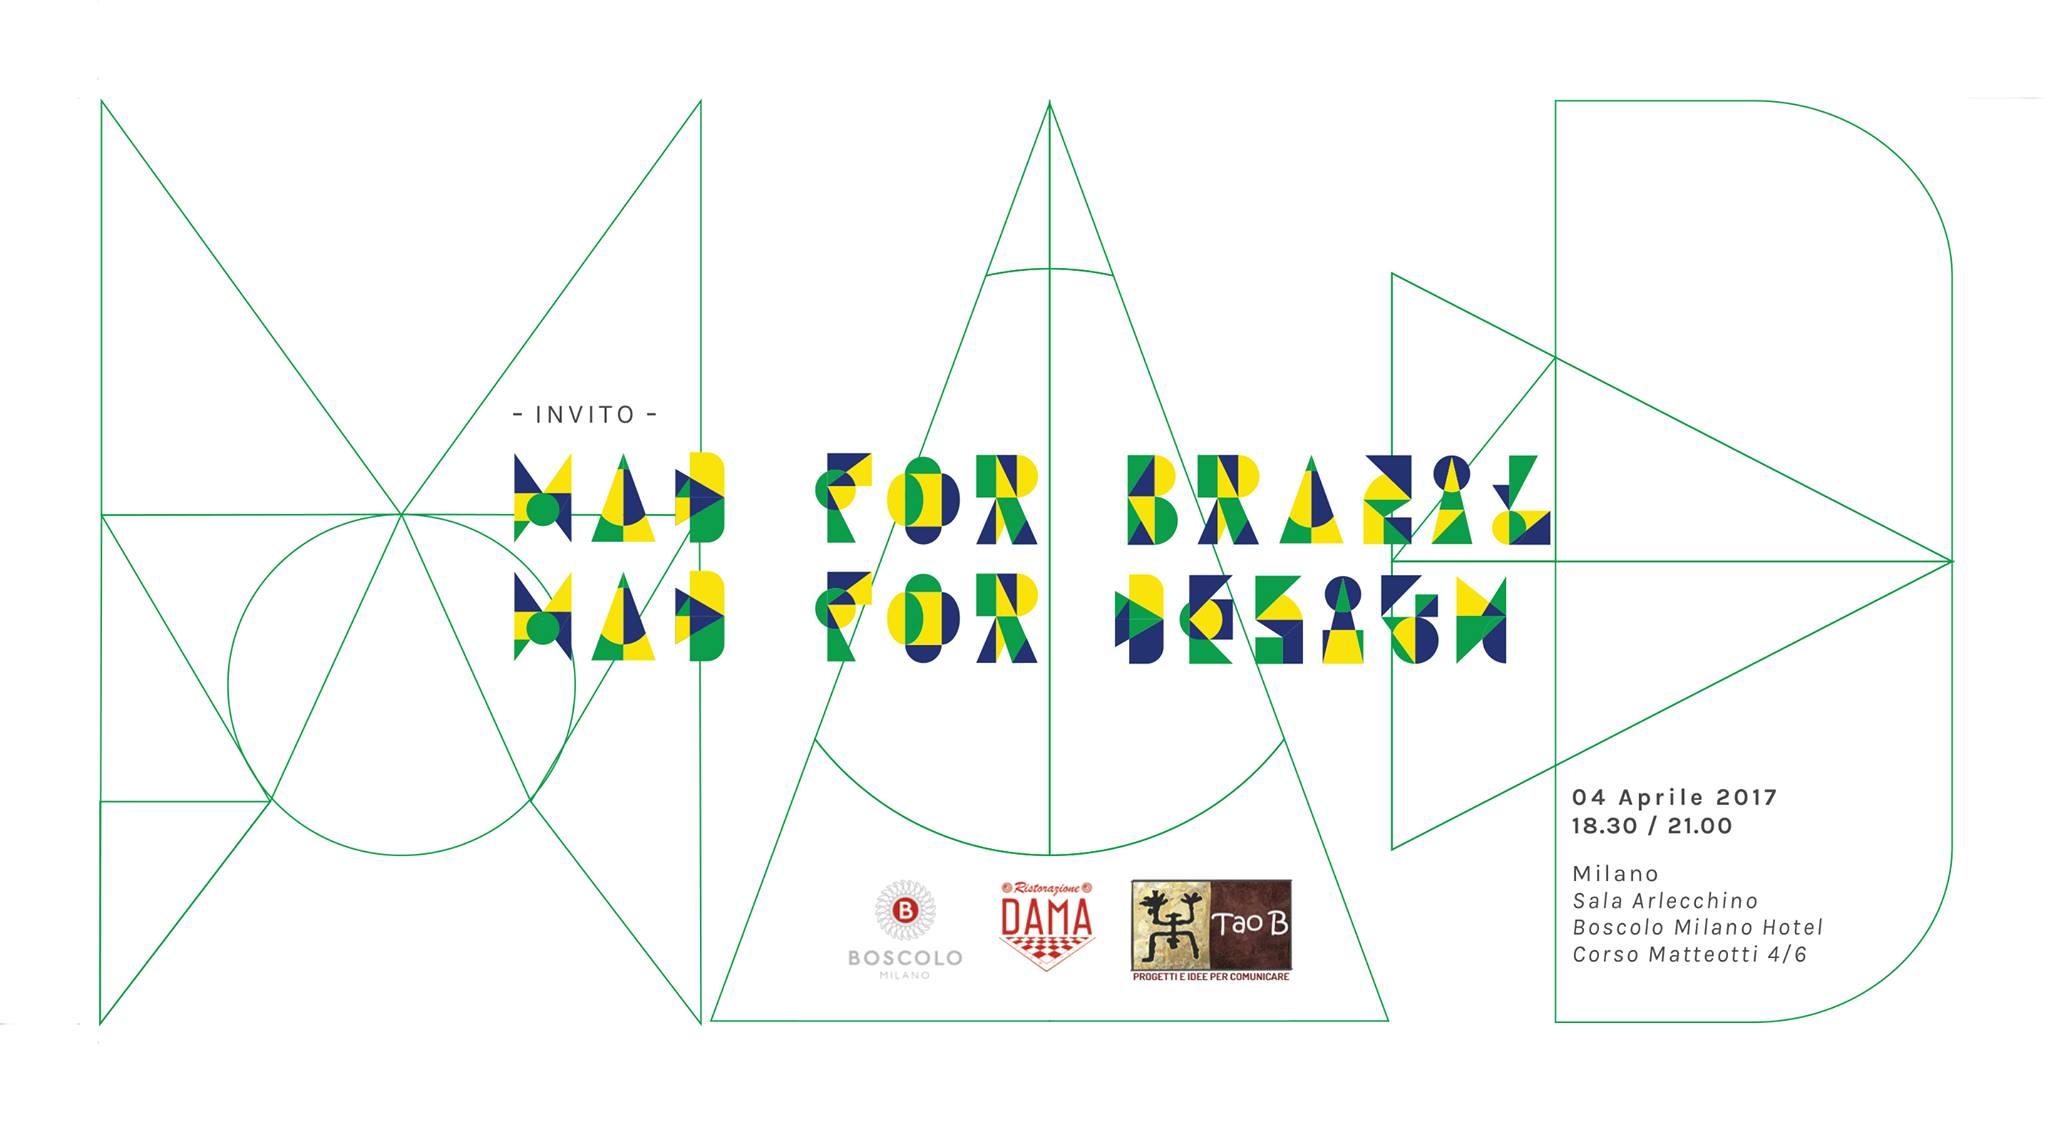 MDW17 / Mad For Brazil? + Boscolo Hotel 5* youparti